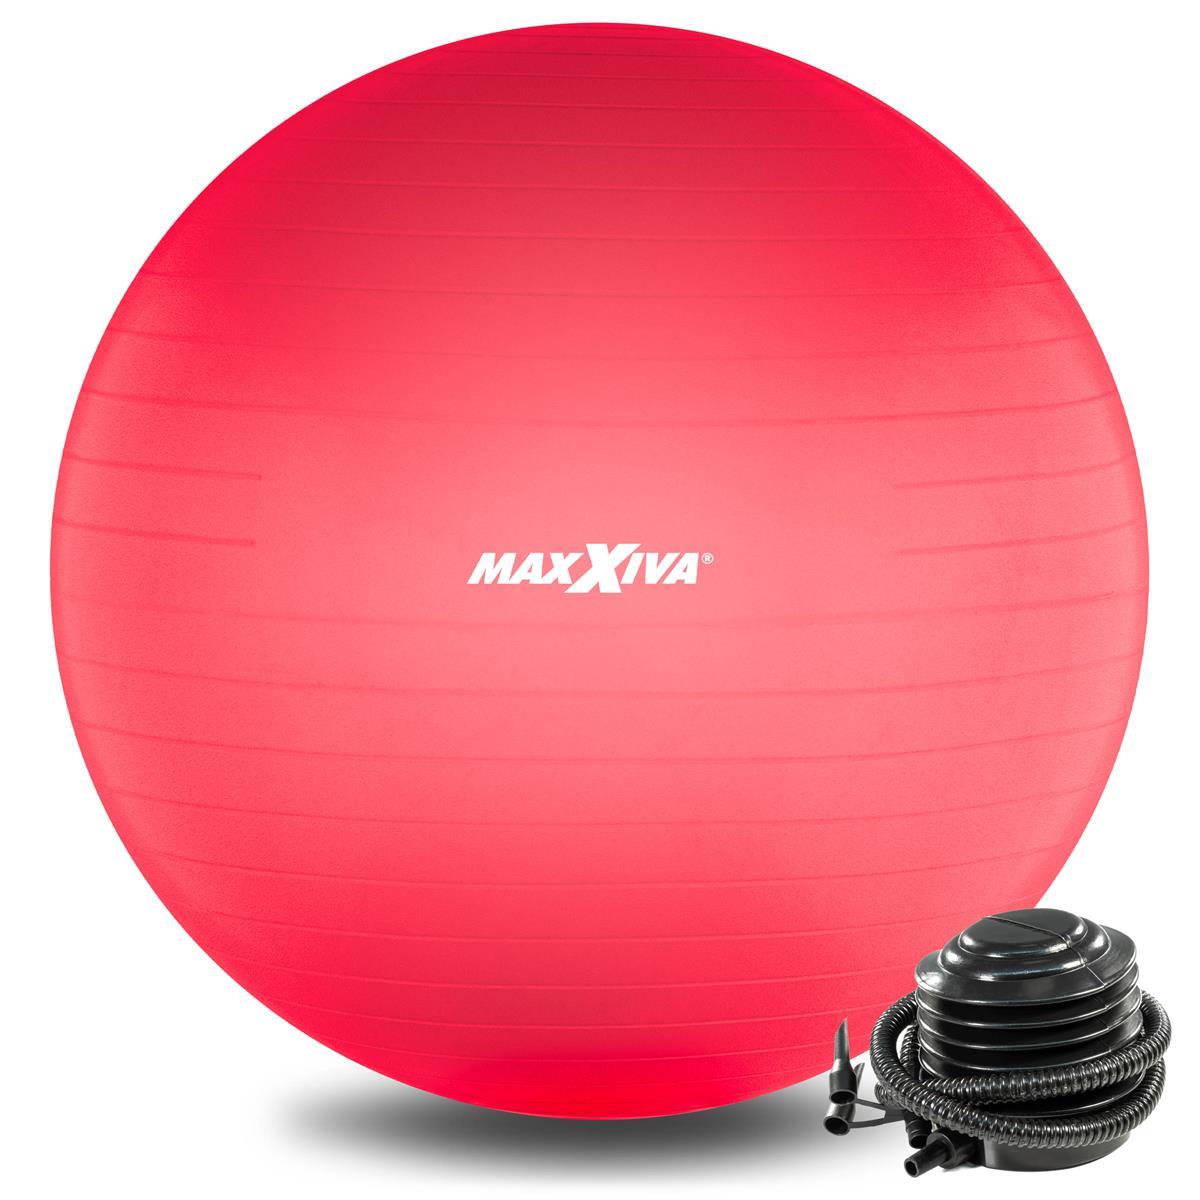 MAXXIVA Gymnastikball Ø 85 cm Rot mit Pumpe Sitzball Fitness Yoga Pilates